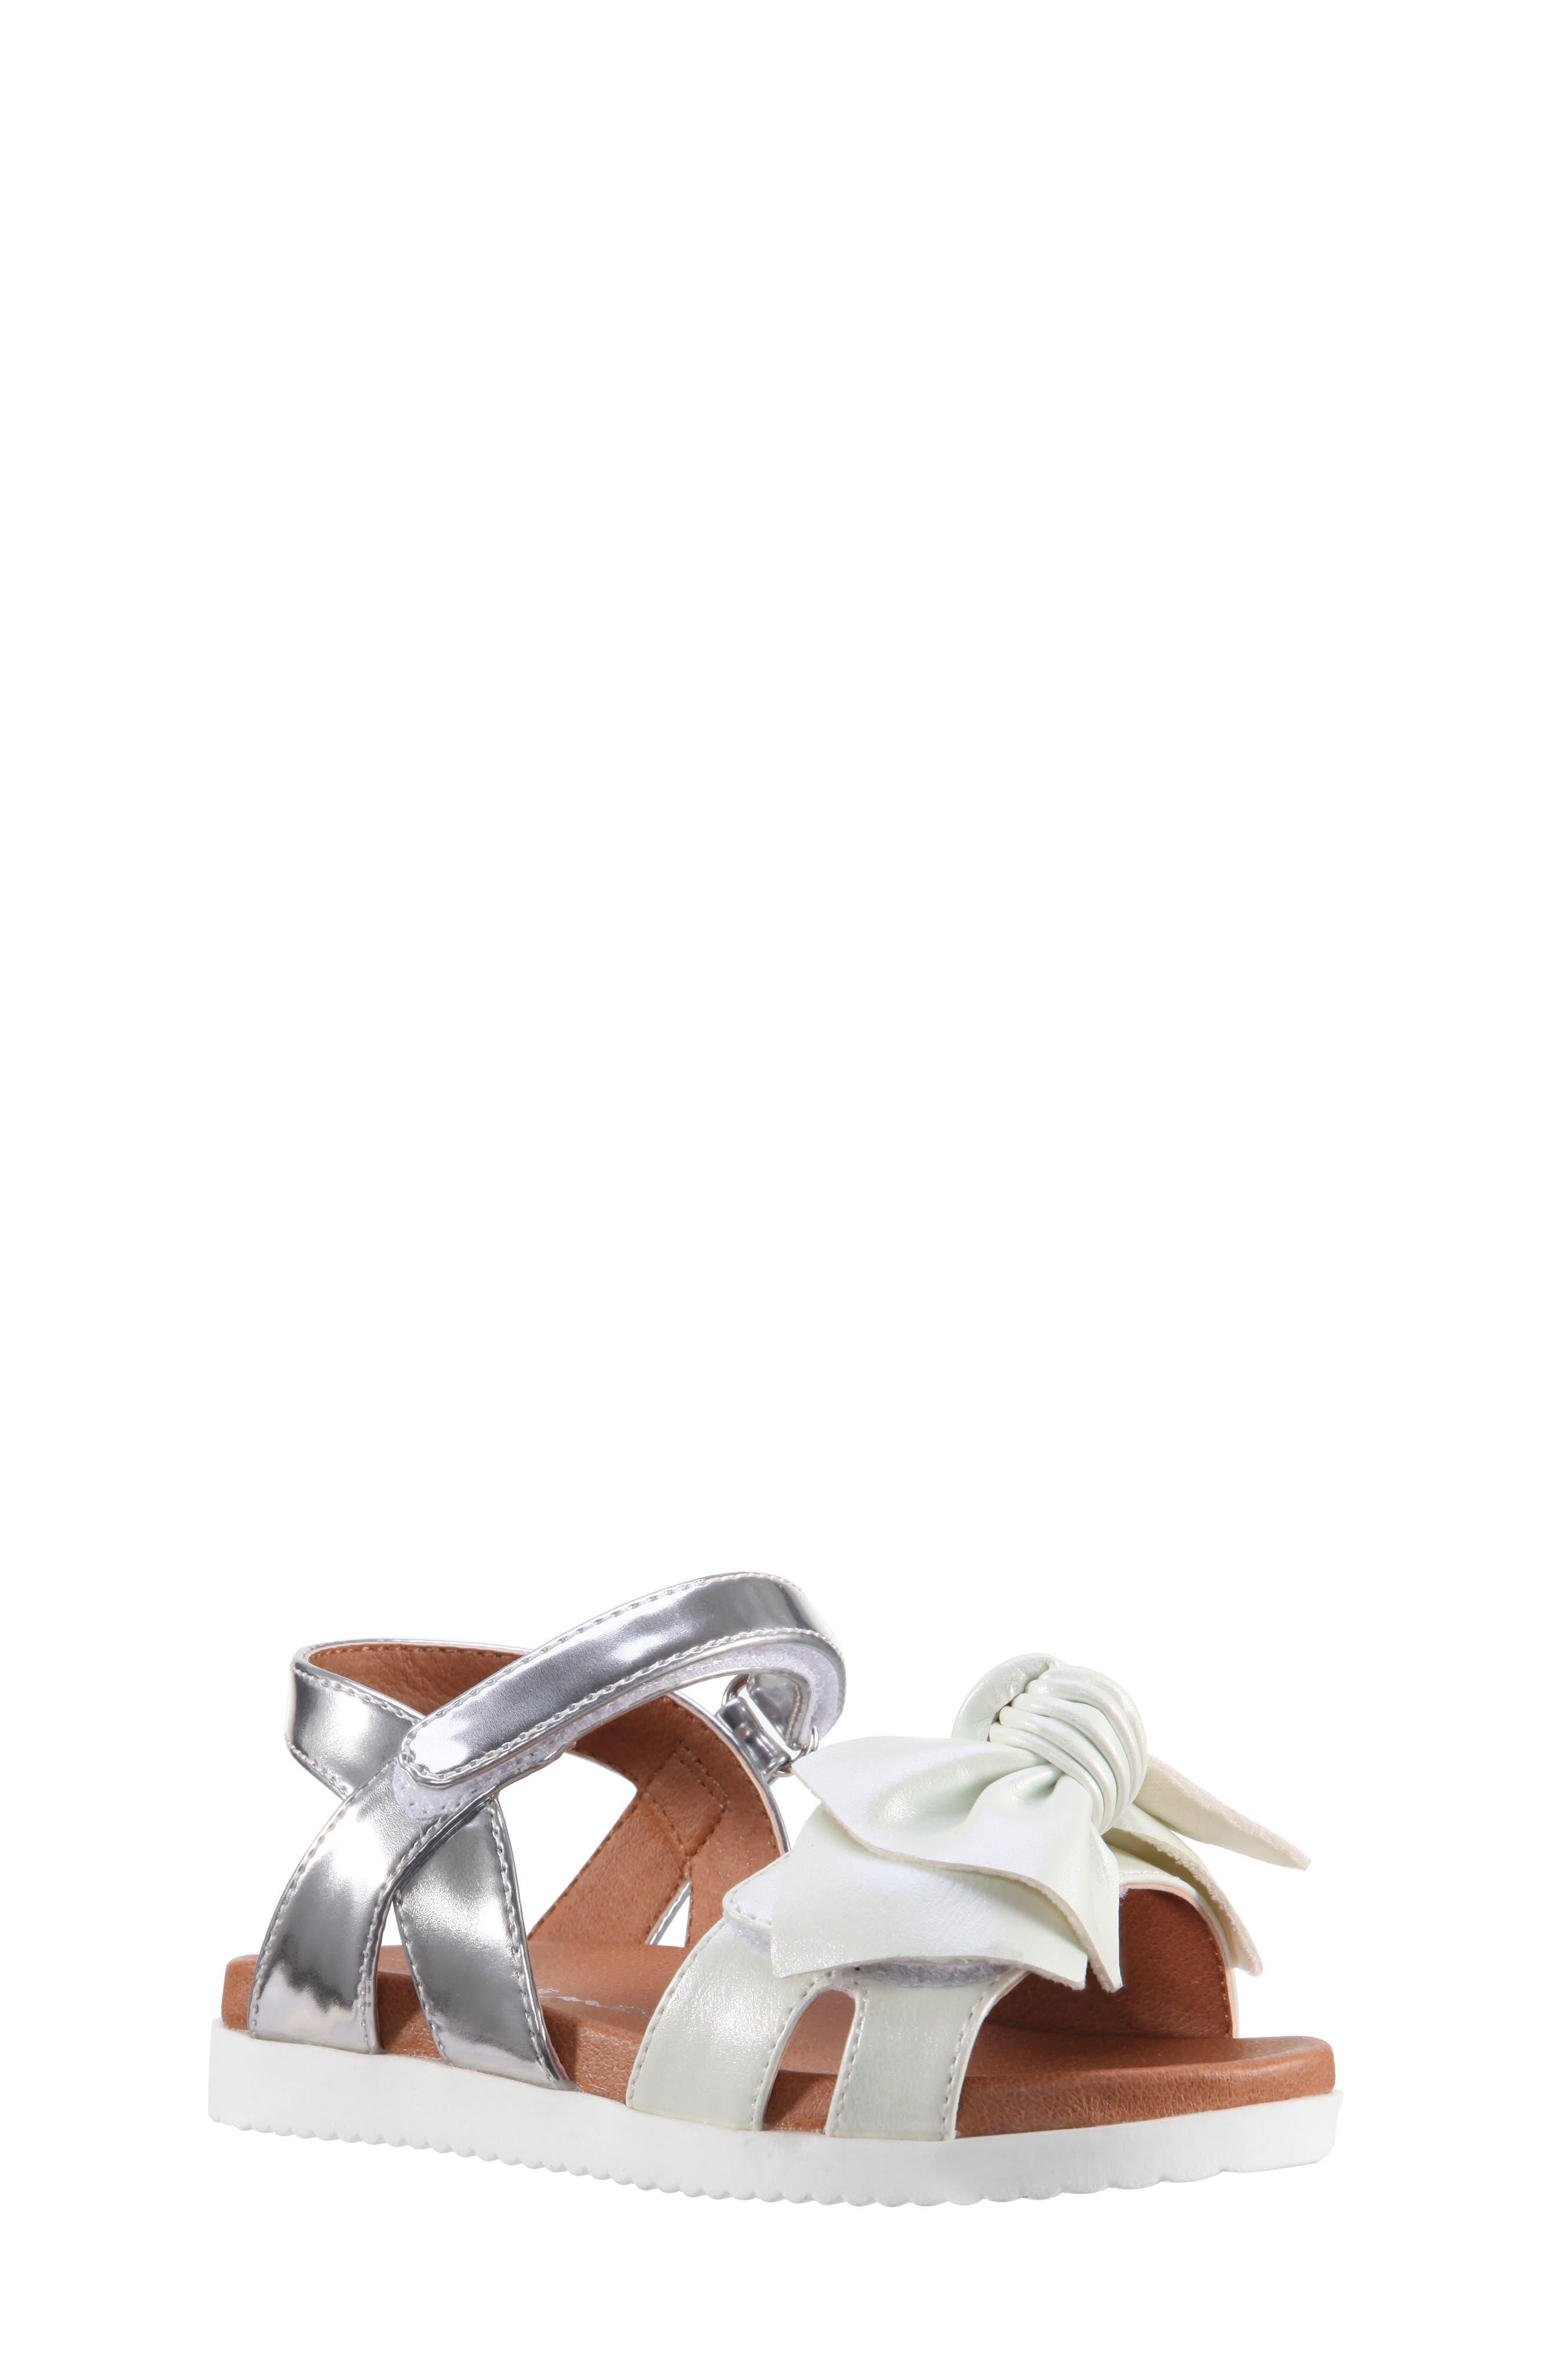 Kaitylyn Bow Sandal,                         Main,                         color, White Metallic/ Silver